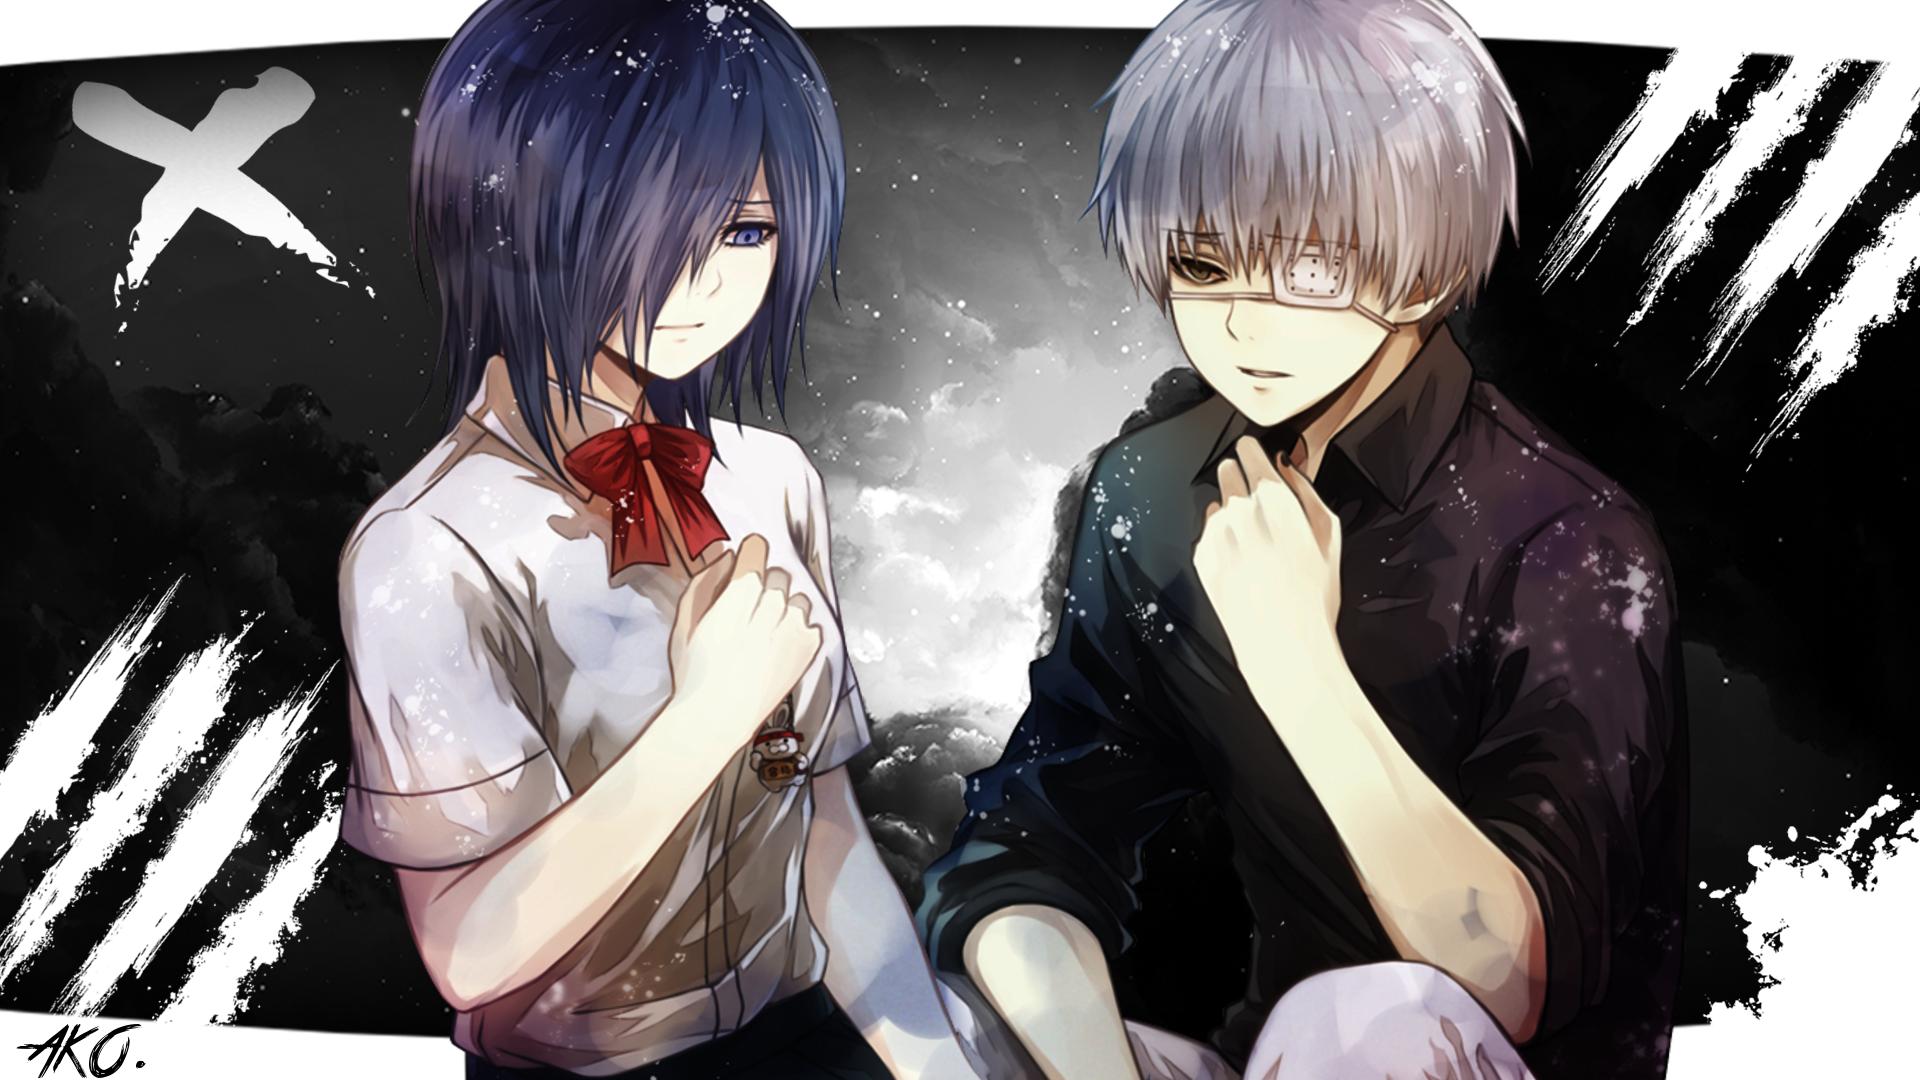 TOUKA AND KANEKI TOKYO GHOUL HD Wallpaper | Background Image